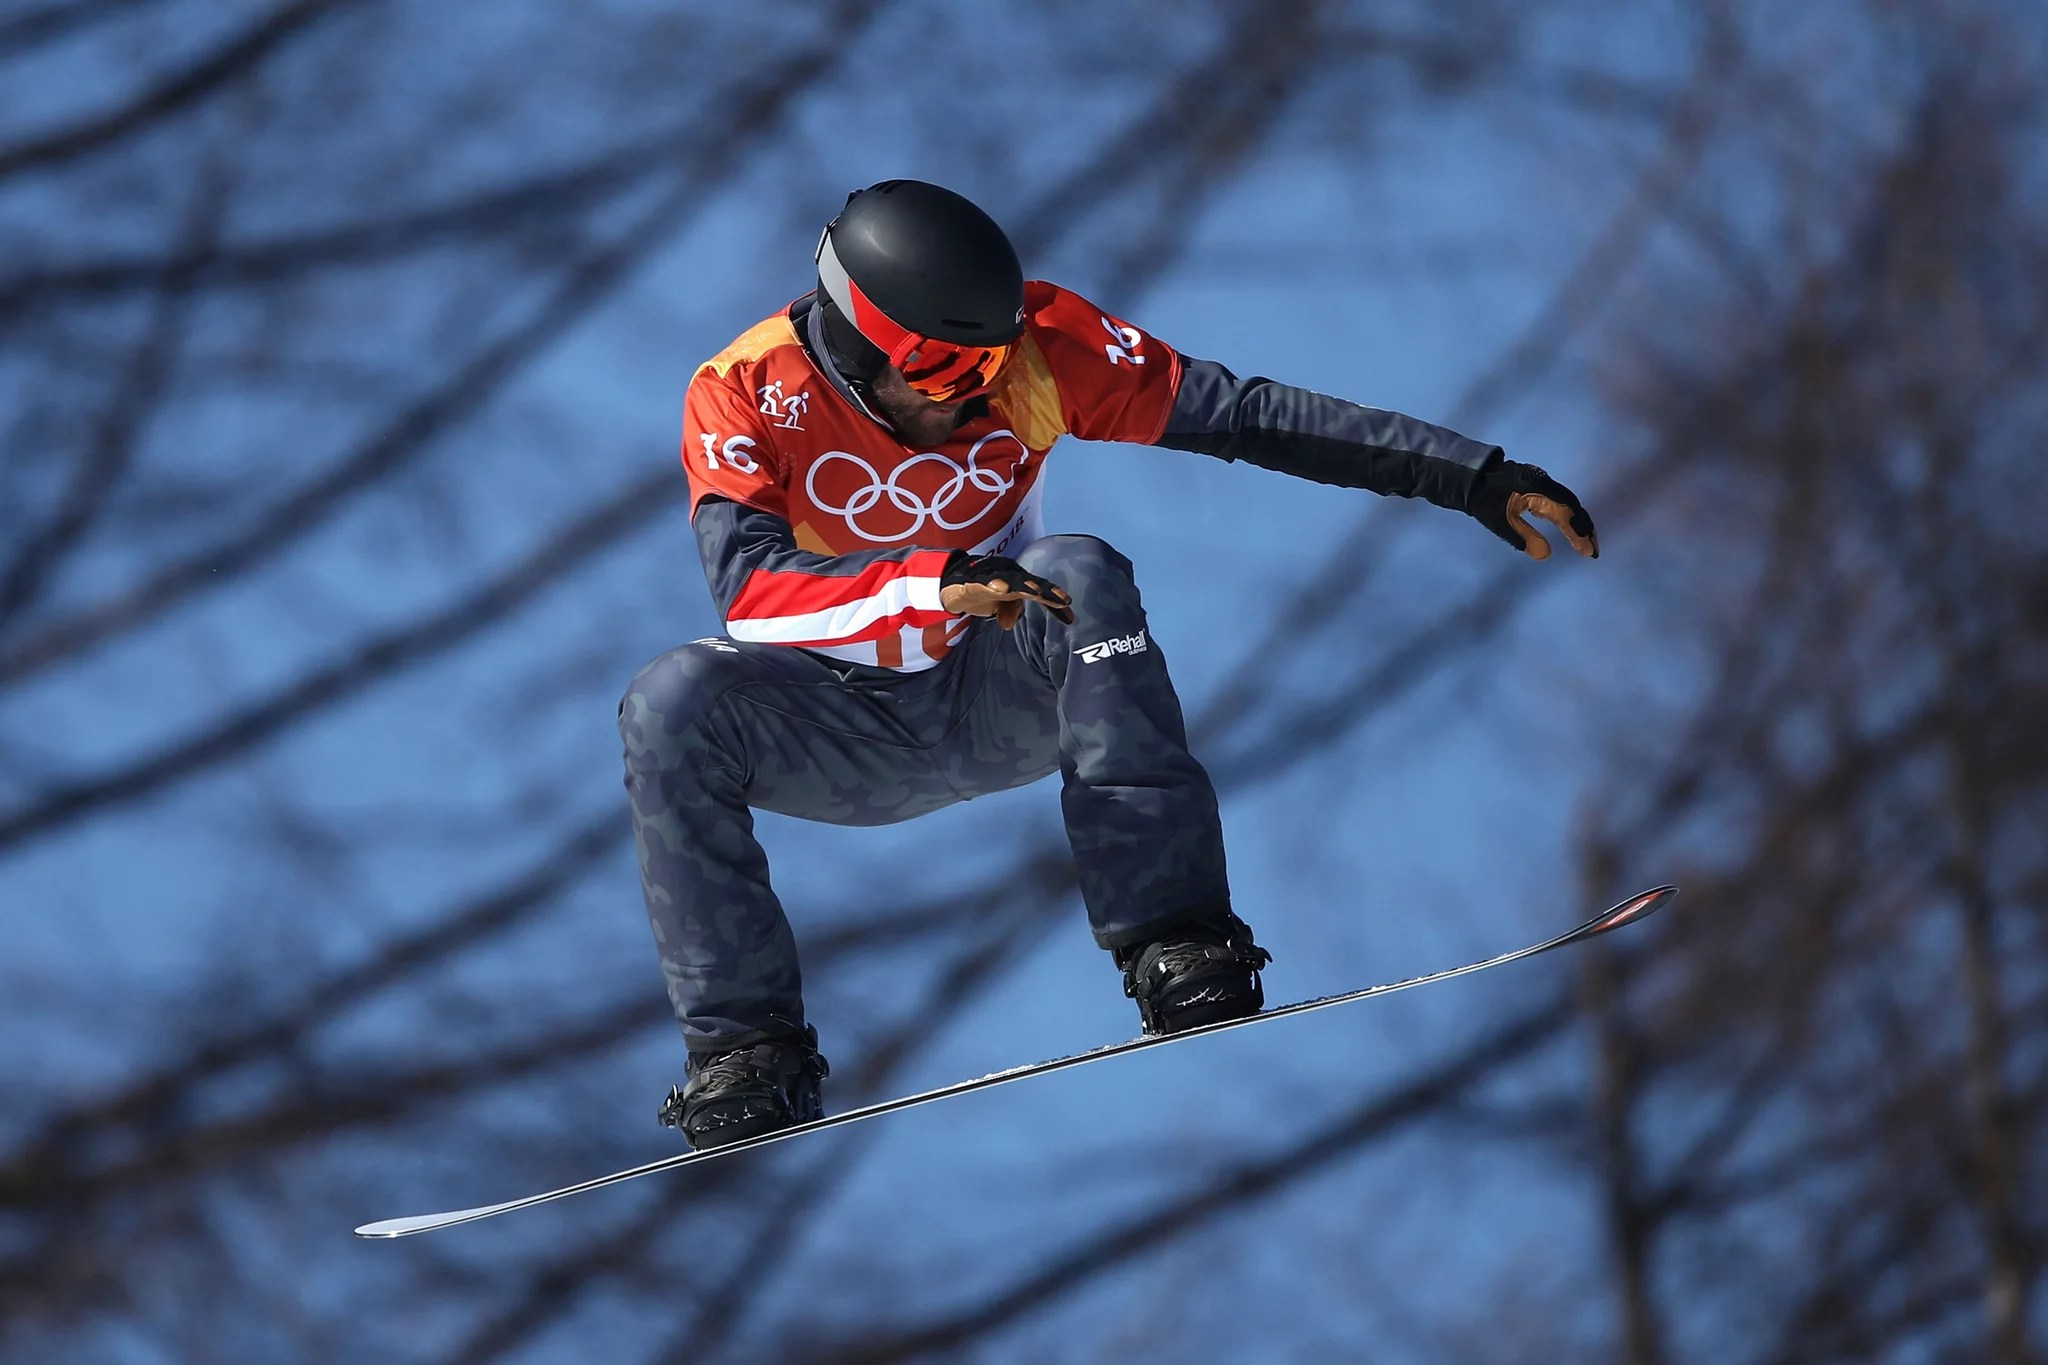 Snowboarder Markus Schairer Breaks Neck Winter Olympics